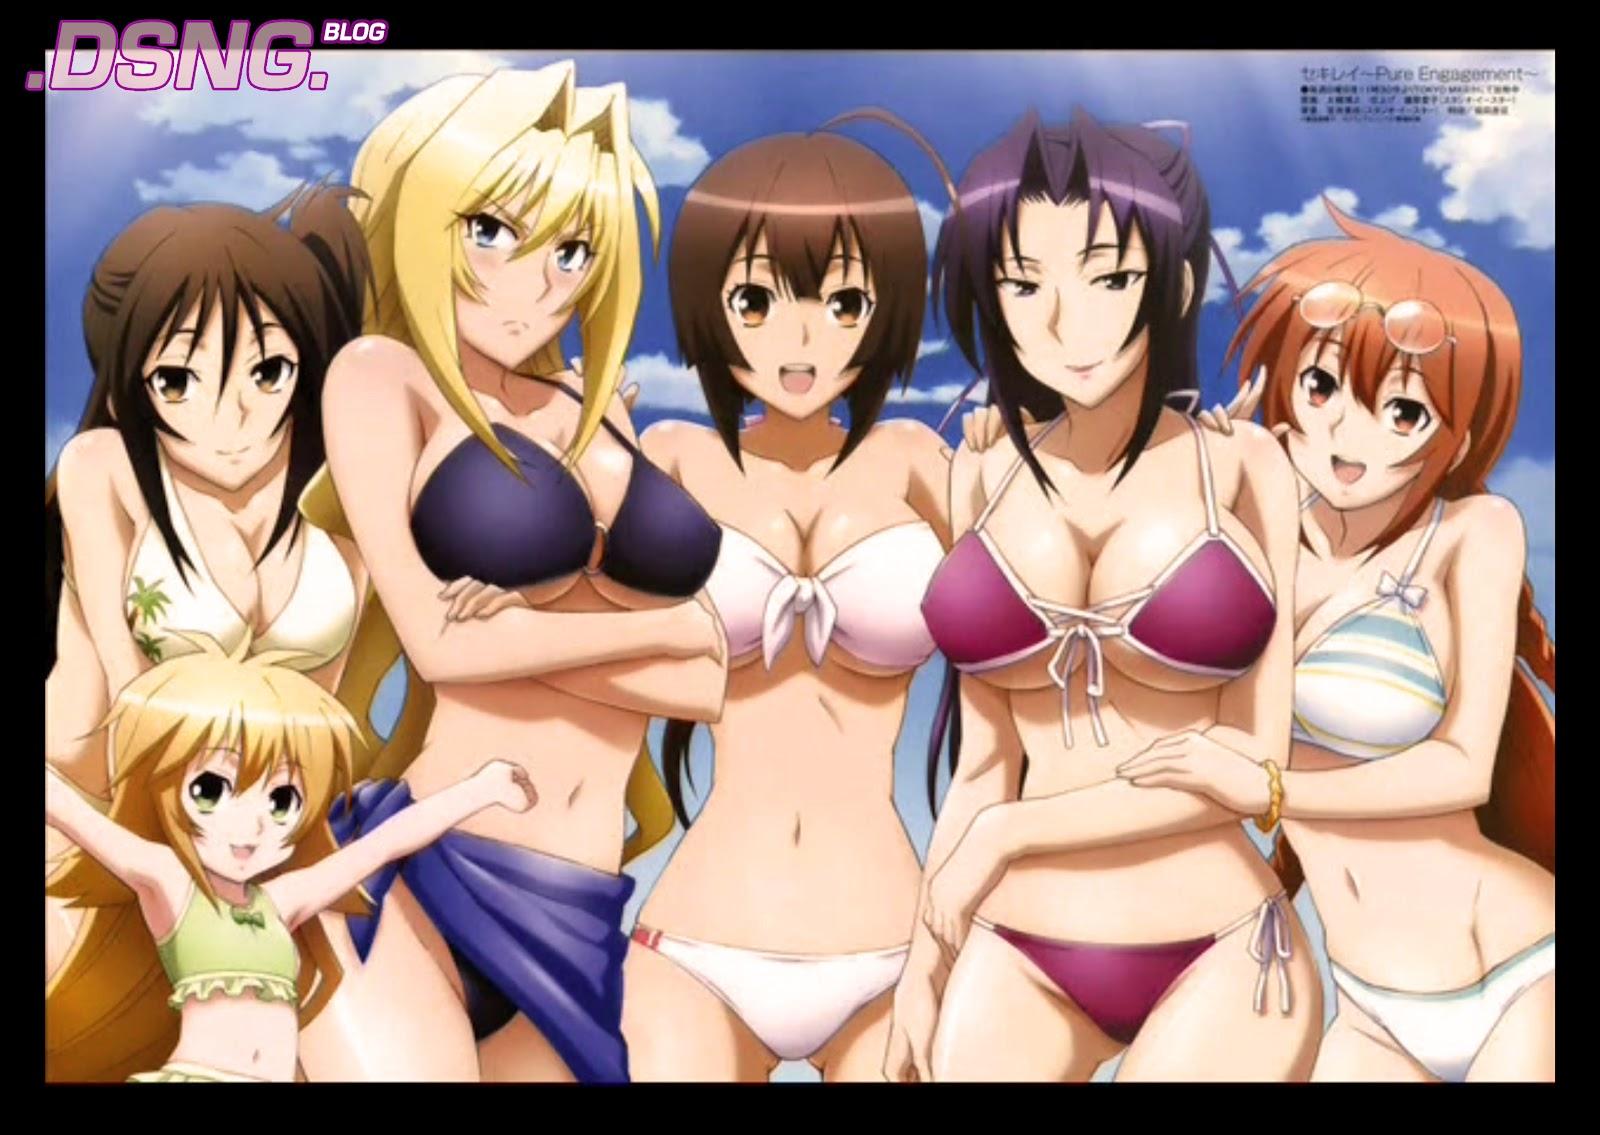 http://2.bp.blogspot.com/-DjyN1-rdeZ4/T7srvXLBsKI/AAAAAAAAFtg/GOWGryXWNRs/s1600/Anime+sexy+wallpaper+girls+darwing+sekirei+ecchi+female+characters+pawg+bikini+big+boobs+huge+breats+tits+beach+hotd+Musubi+Matsu+Homura+Kazehana+Kusano+Tsukiumi.jpg